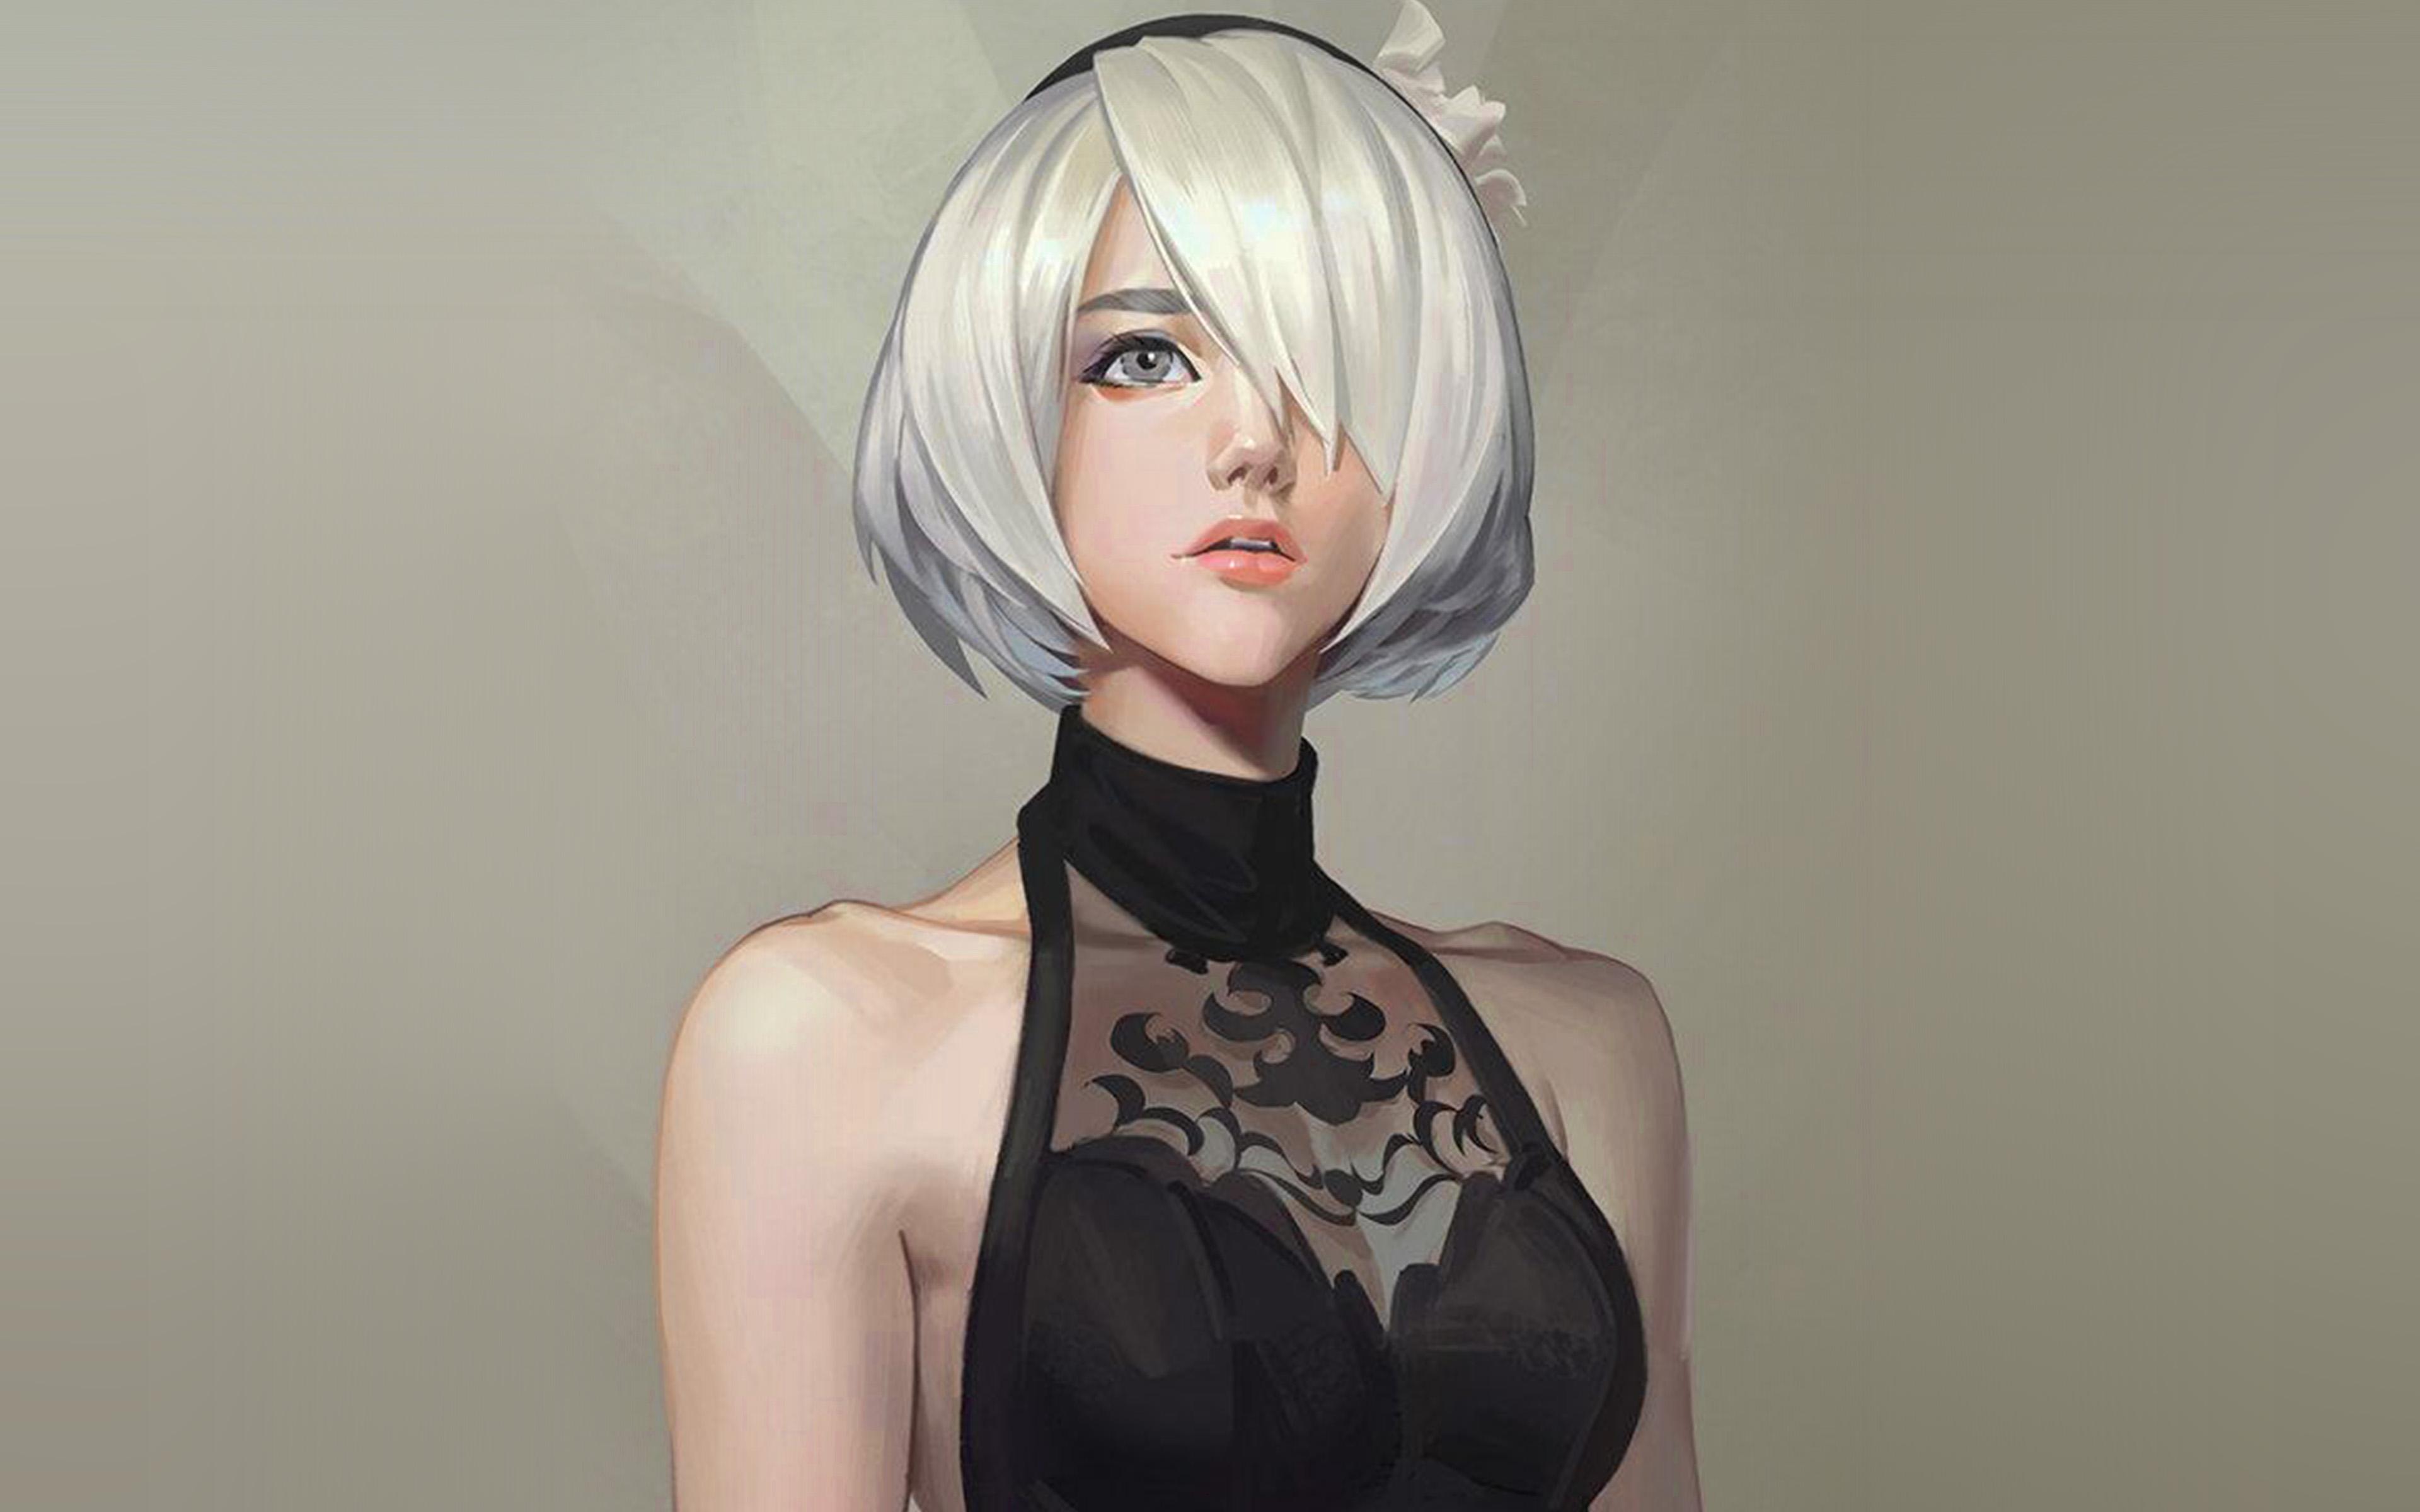 Bd51-didivi-anime-painting-girl-art-illustration-wallpaper